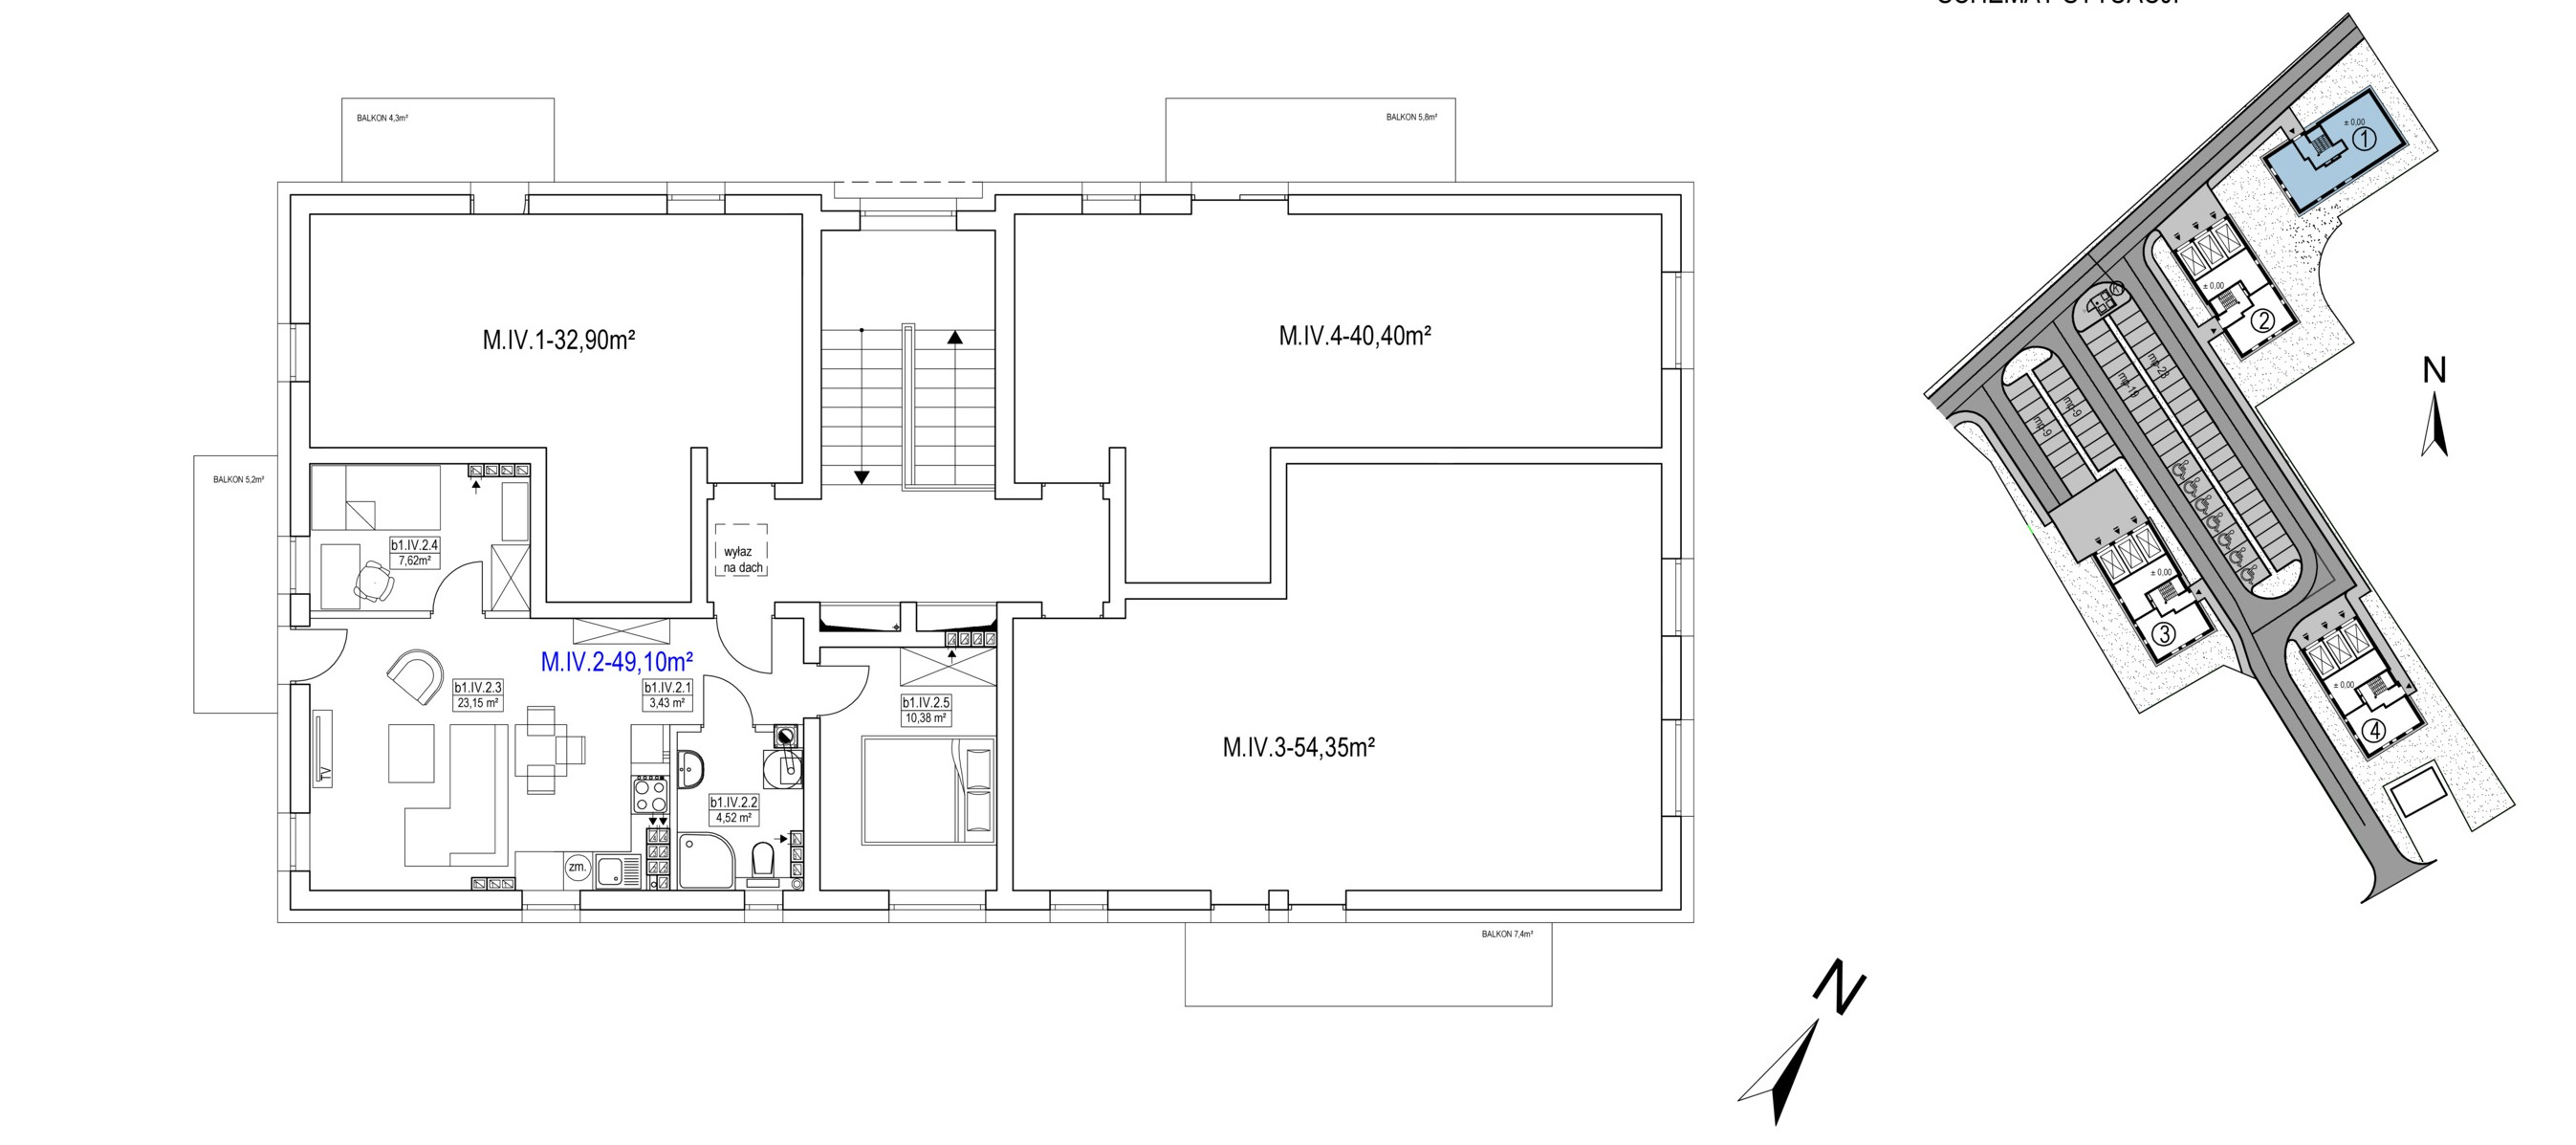 /assets/img/flats/B1.M.IV.2.jpg